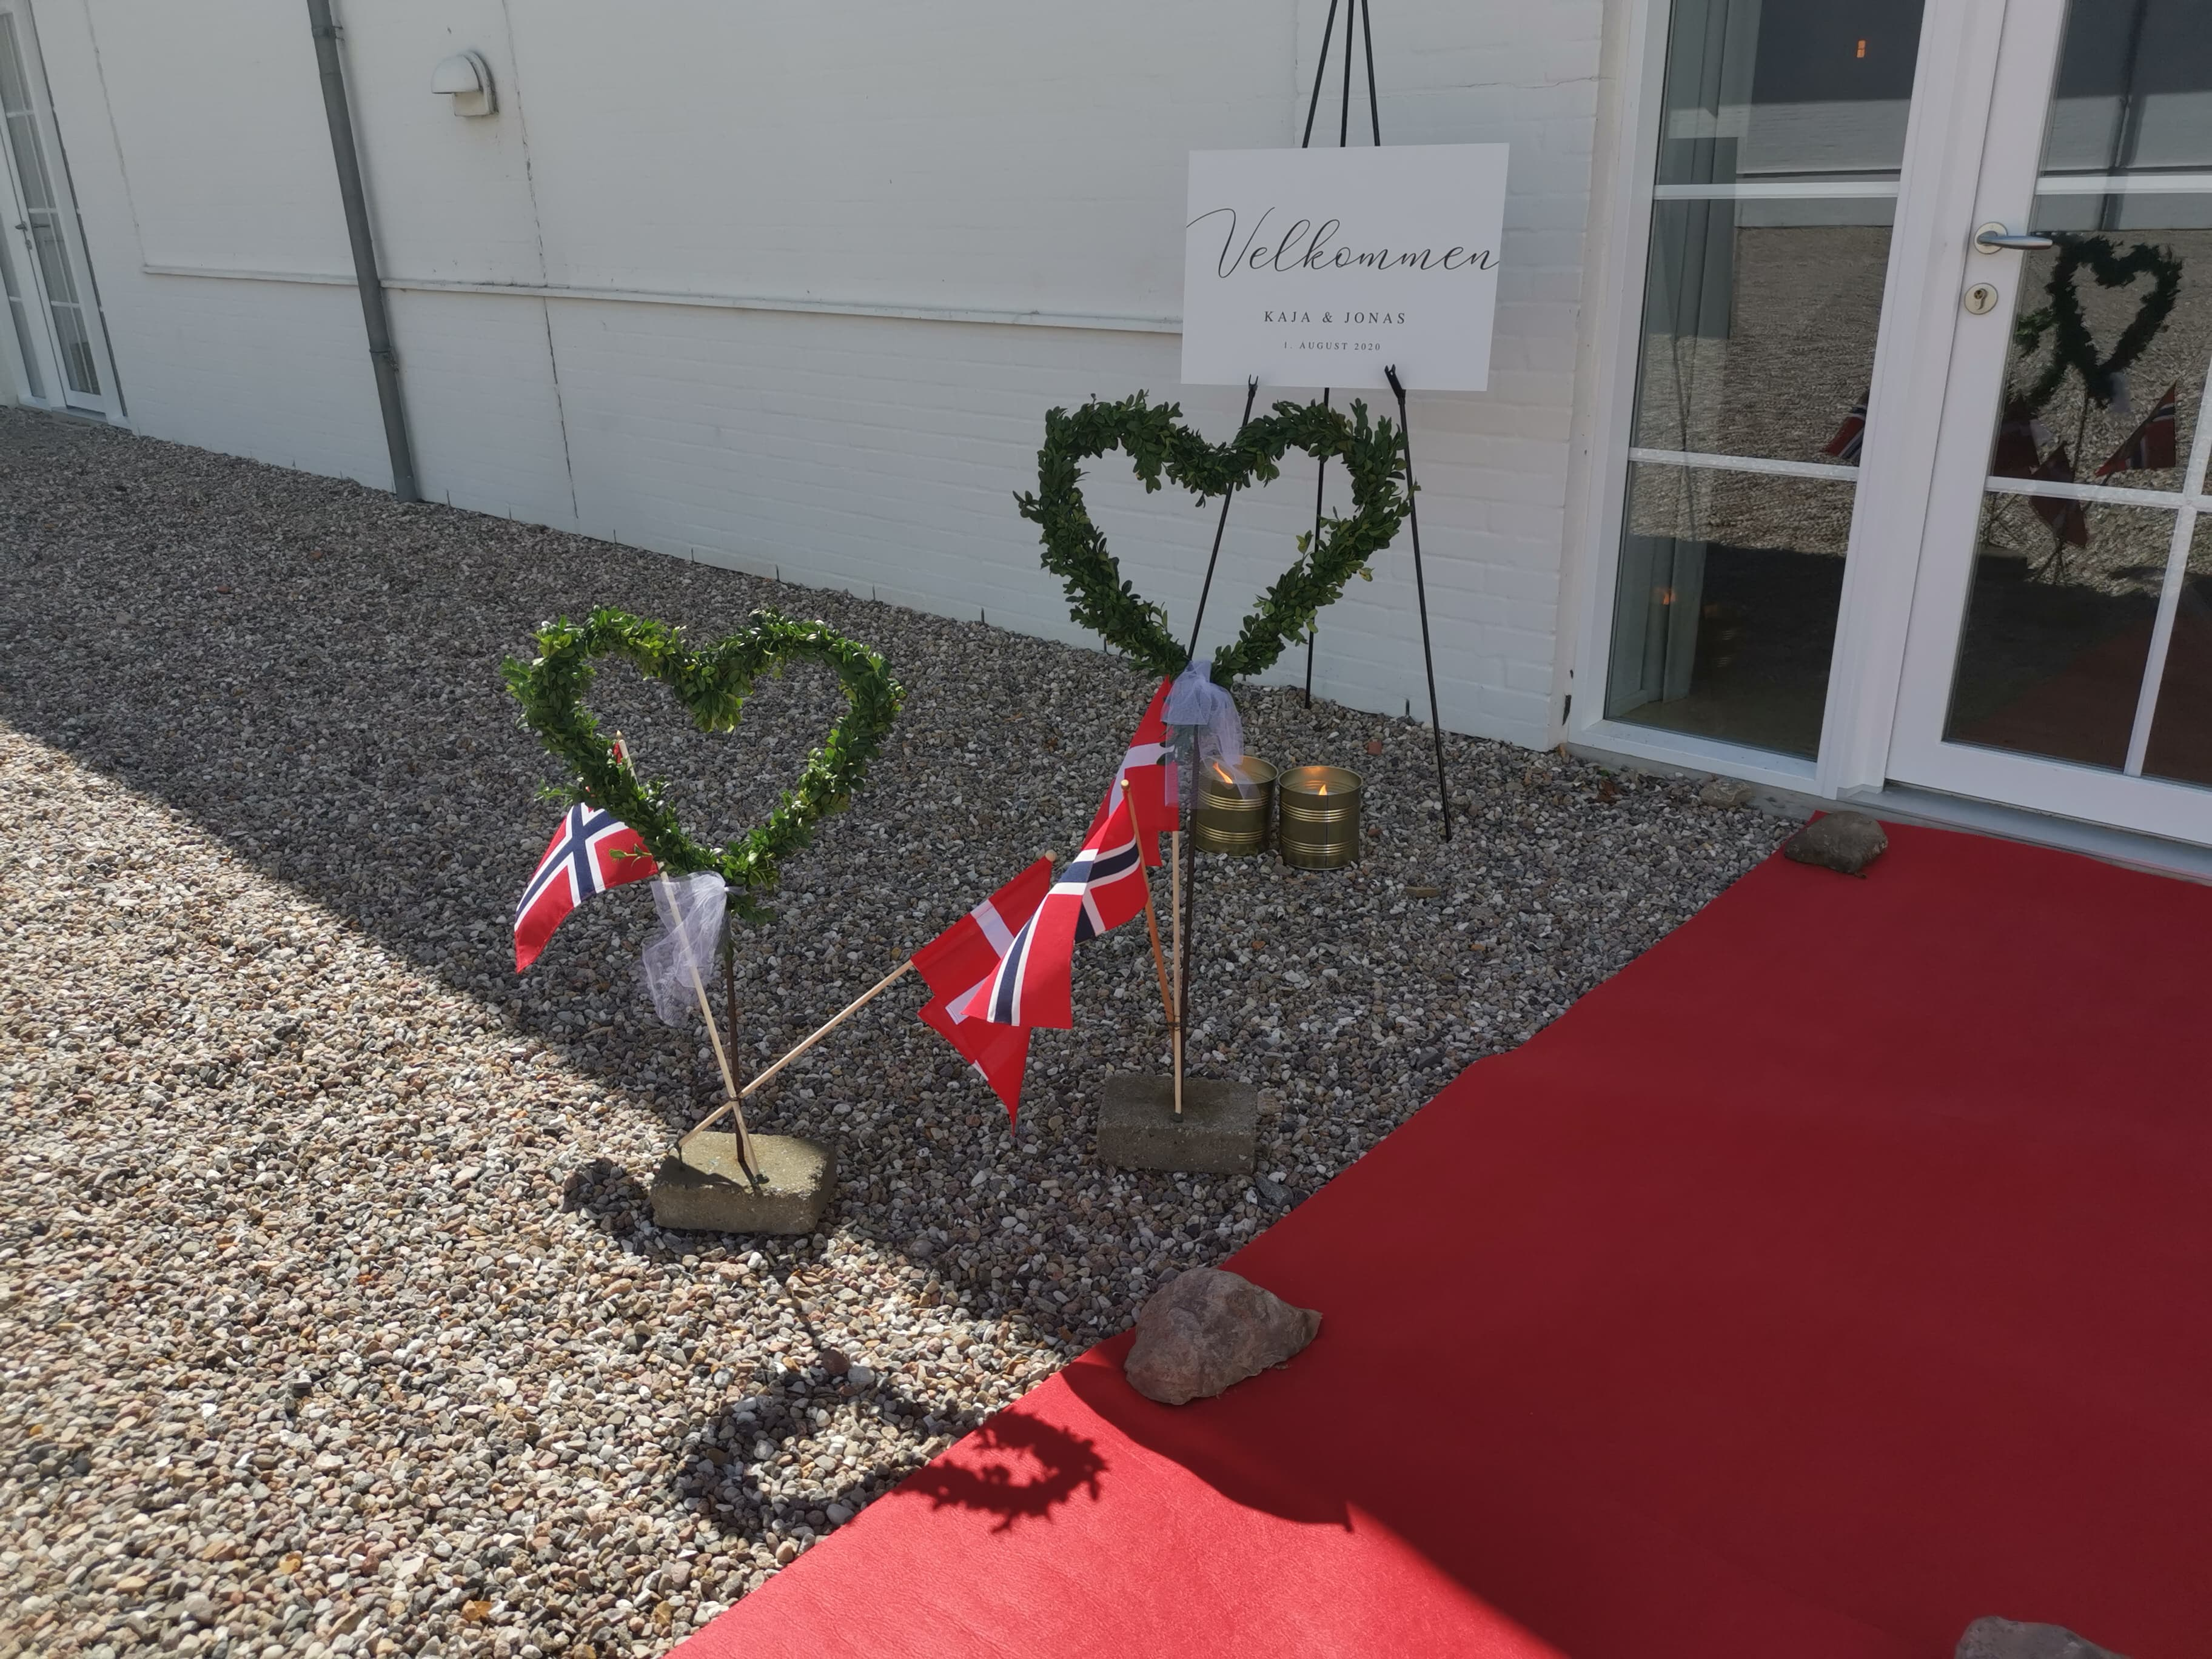 Kaja & Jonas - Dansk Norsk bryllup